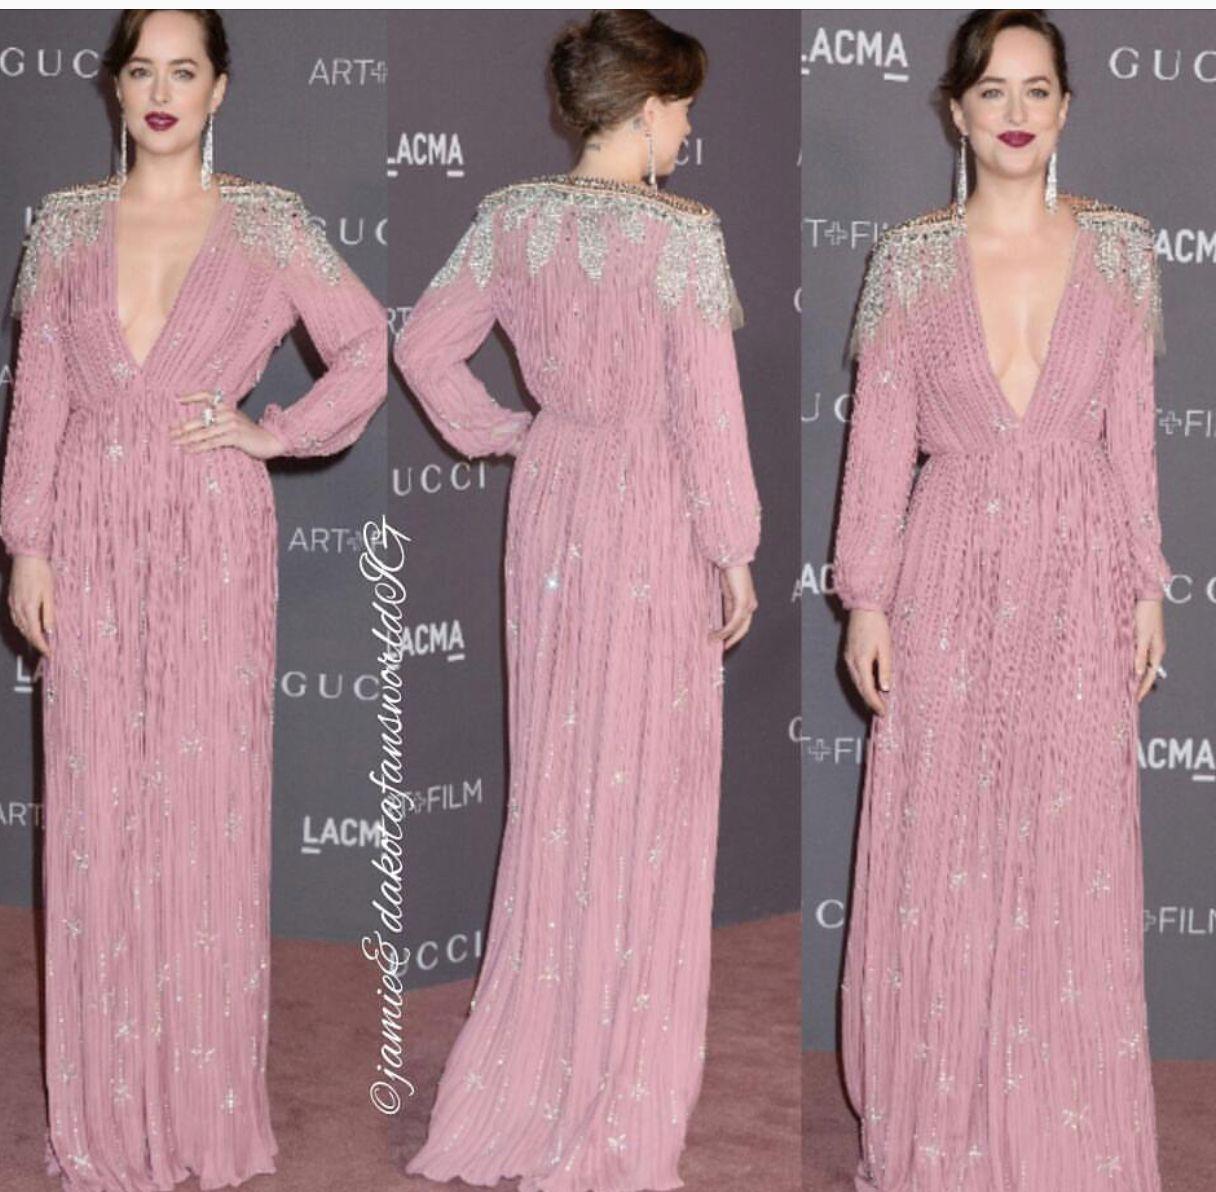 Gracias Gucci por vestir a la reina | Dakota | Pinterest | Gucci, La ...